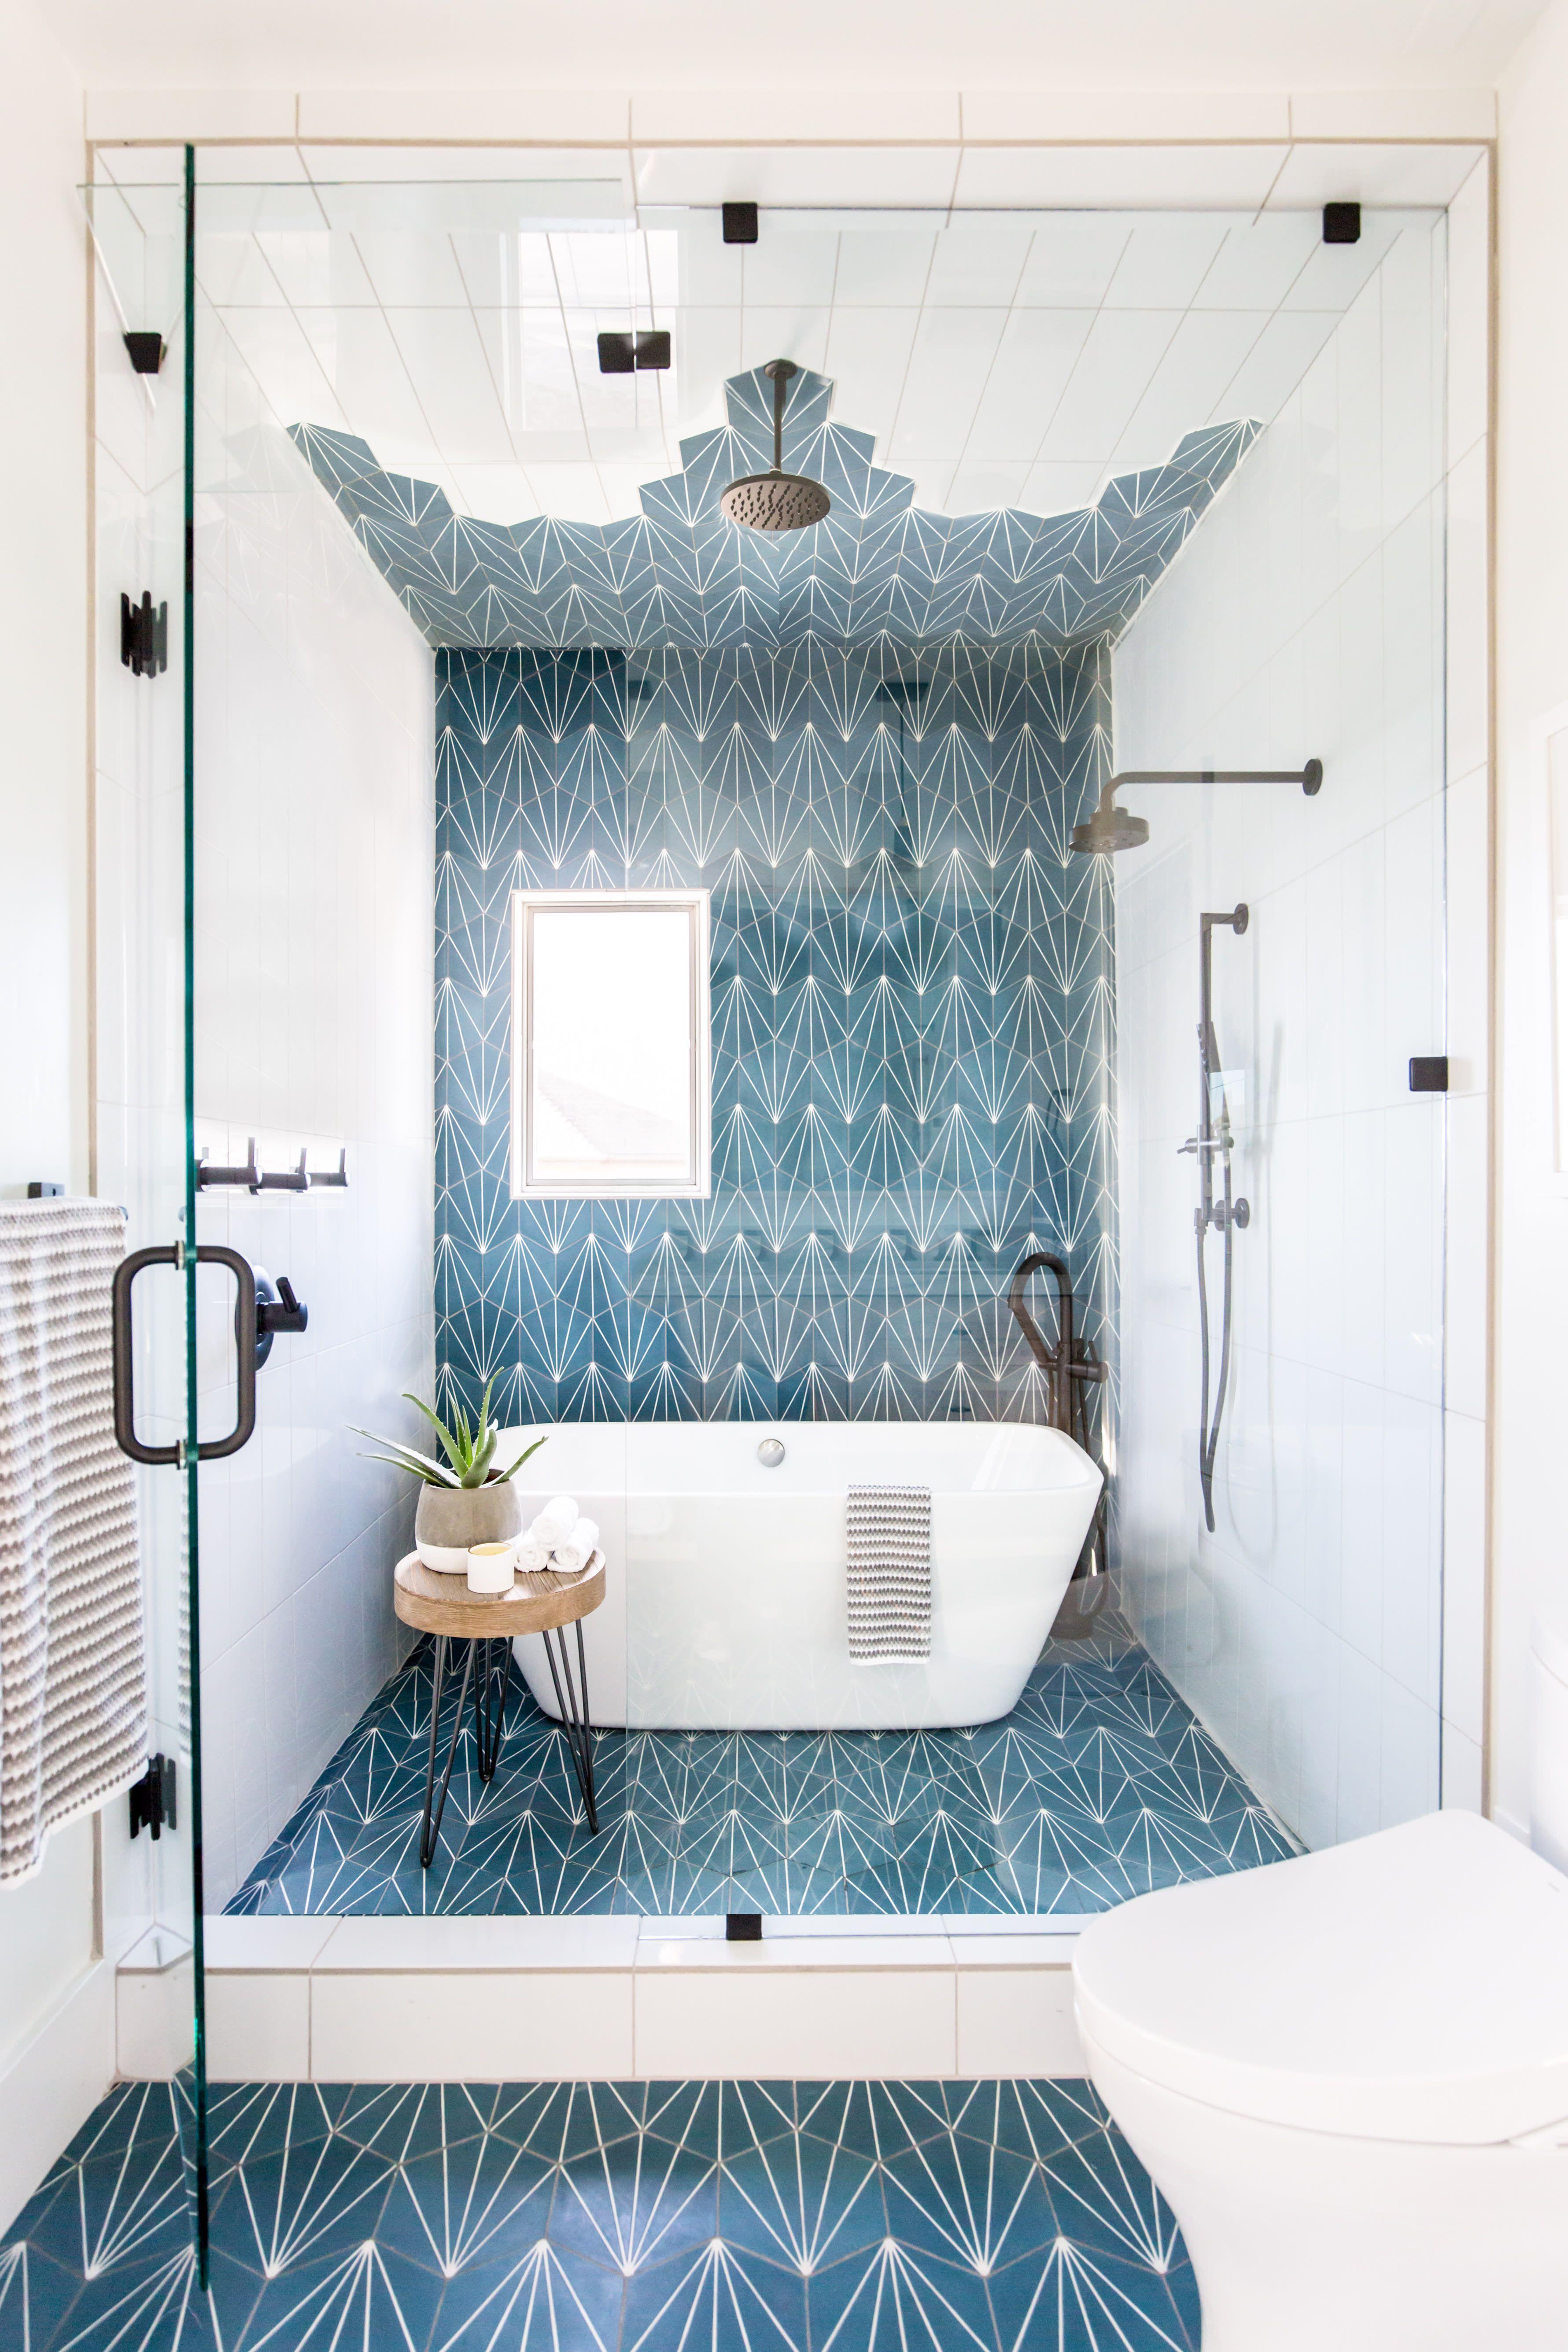 This Vibrant Jack And Jill Kids Bathroom Is Made For Sharing Bathroom Interior Design Bathroom Design Kids Bathroom Design